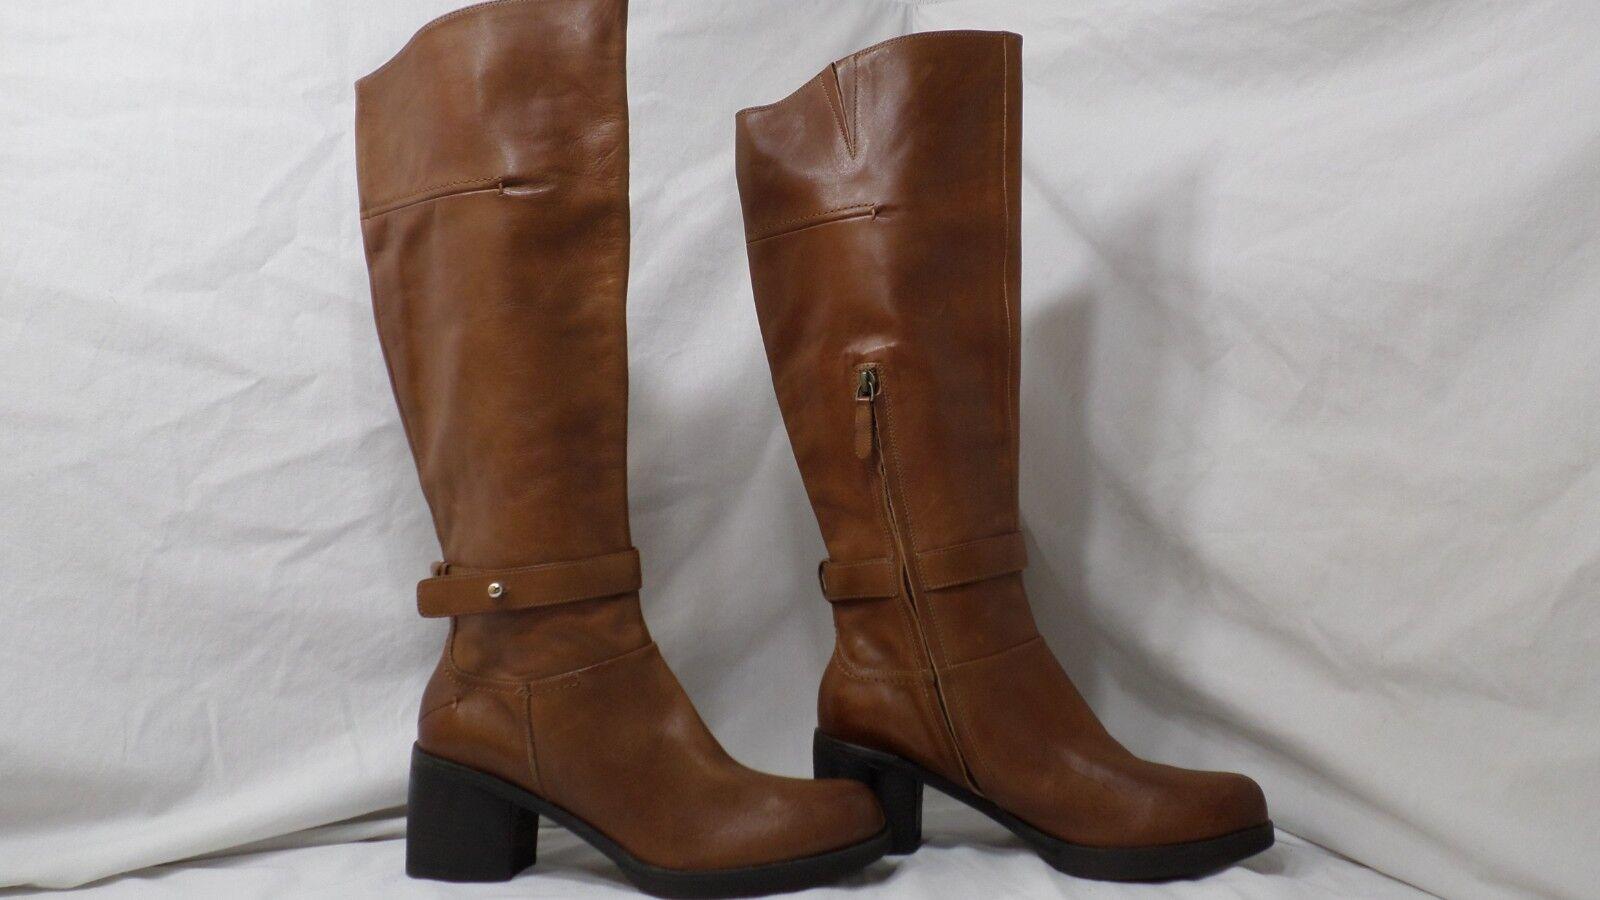 Halogen Chestnut Marronee Leather Chunky Heel Knee High avvio Mismatch Dimensione 9 9.5 M